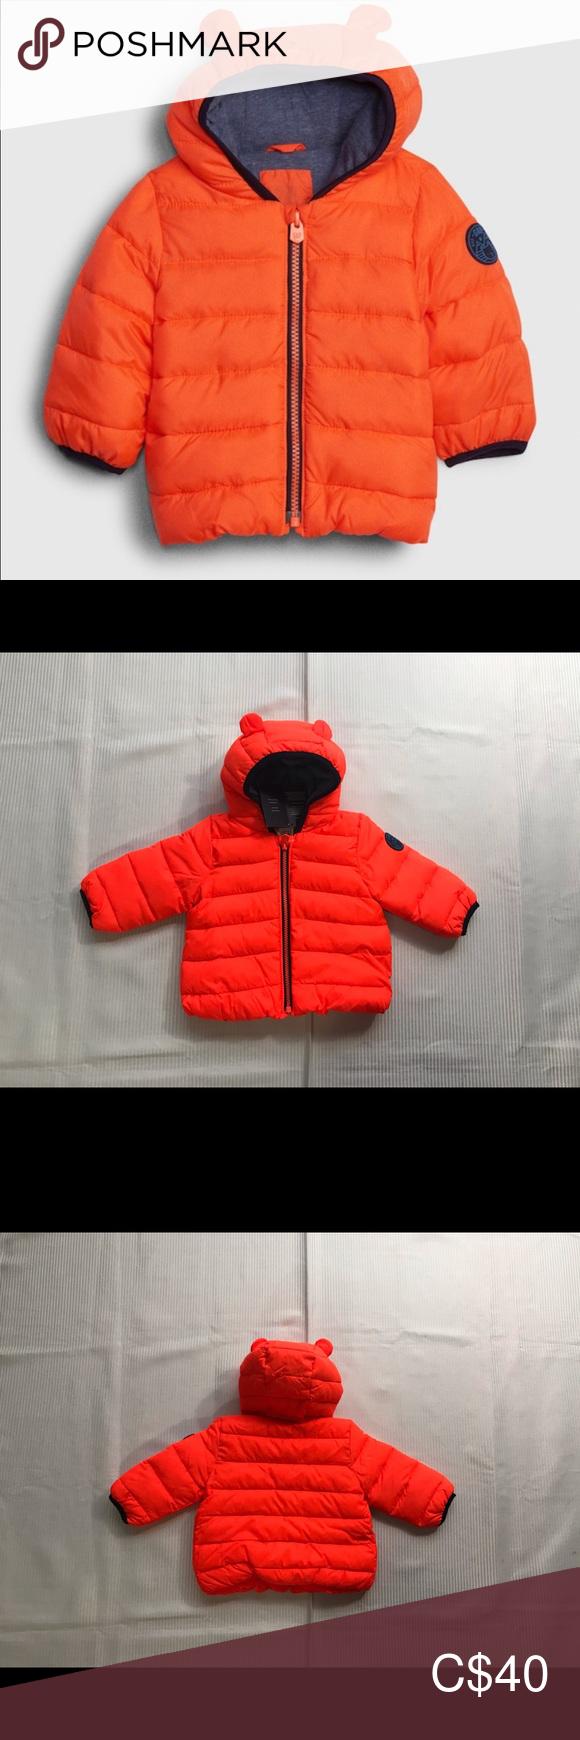 Baby Gap Cold Control Lightweight Puffer Jacket Baby Gap Cold Control Lightweight Hooded Bear Puffer Jacket Nwt Toddler Sz 6 Baby Gap Puffer Jackets Gap Jacket [ 1740 x 580 Pixel ]